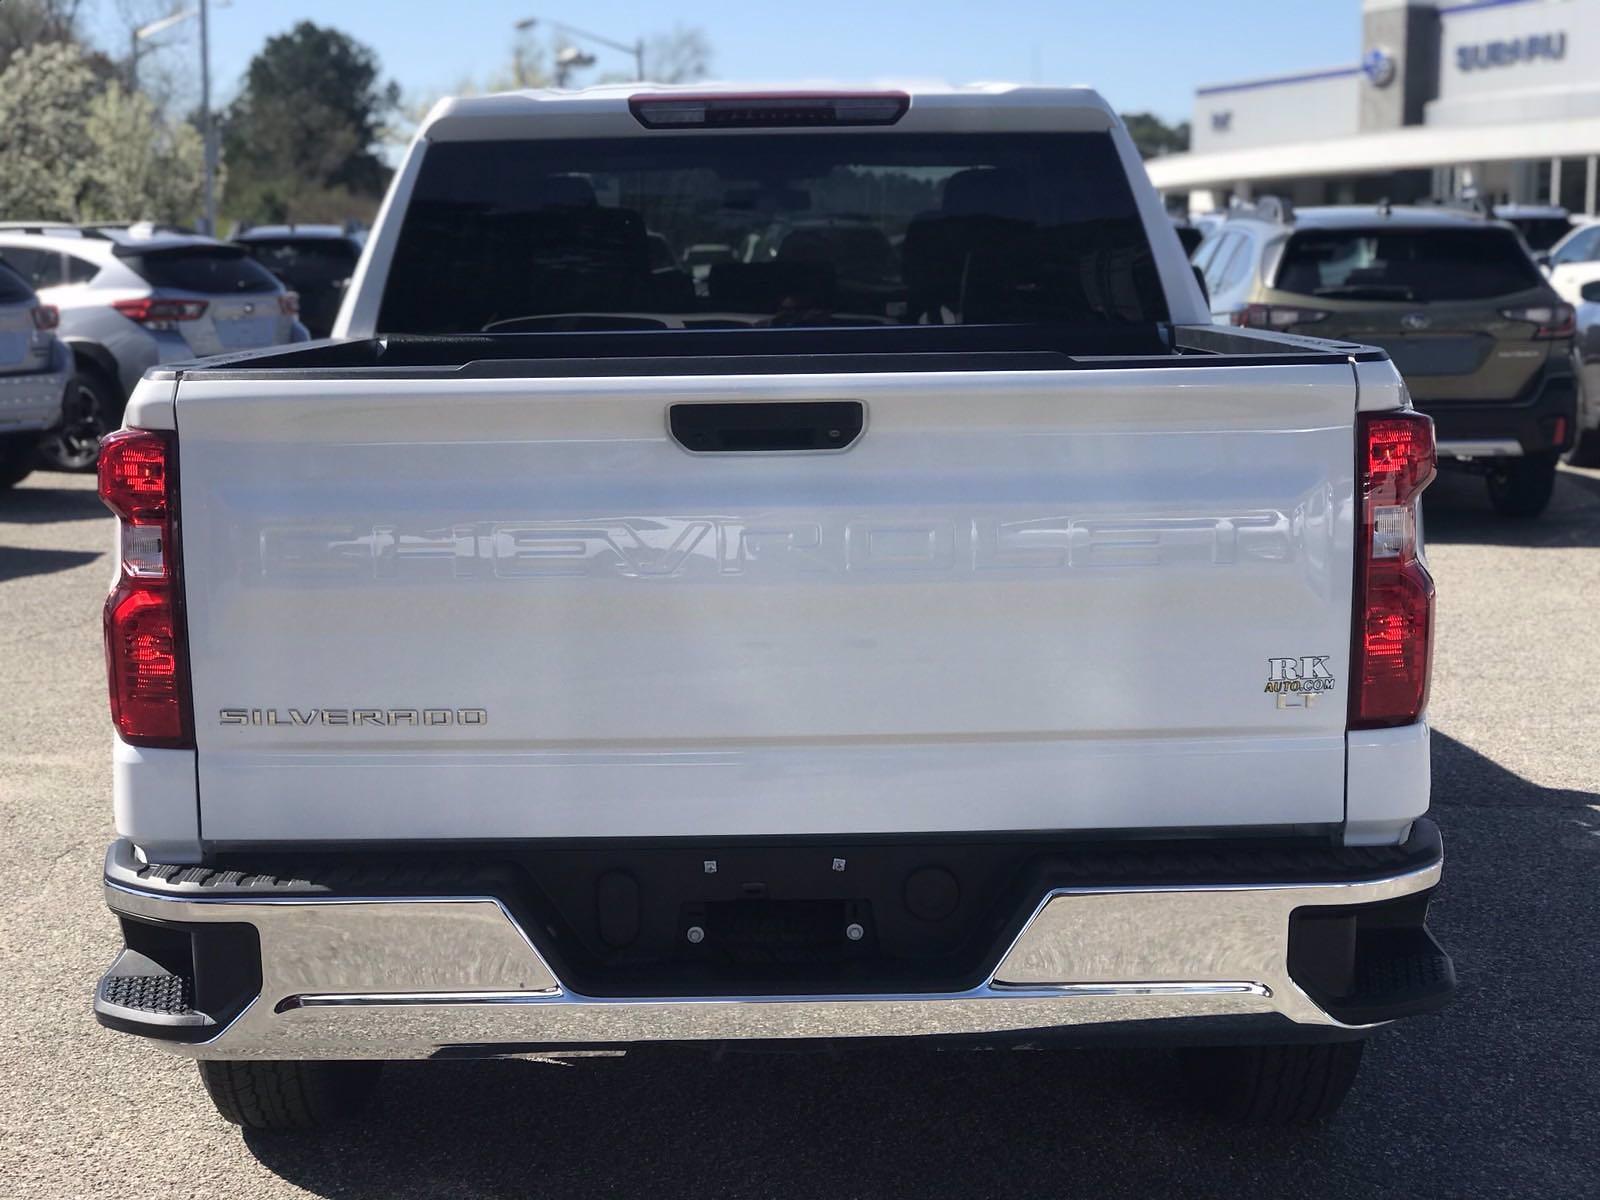 2020 Chevrolet Silverado 1500 Crew Cab 4x4, Pickup #16464PN - photo 8